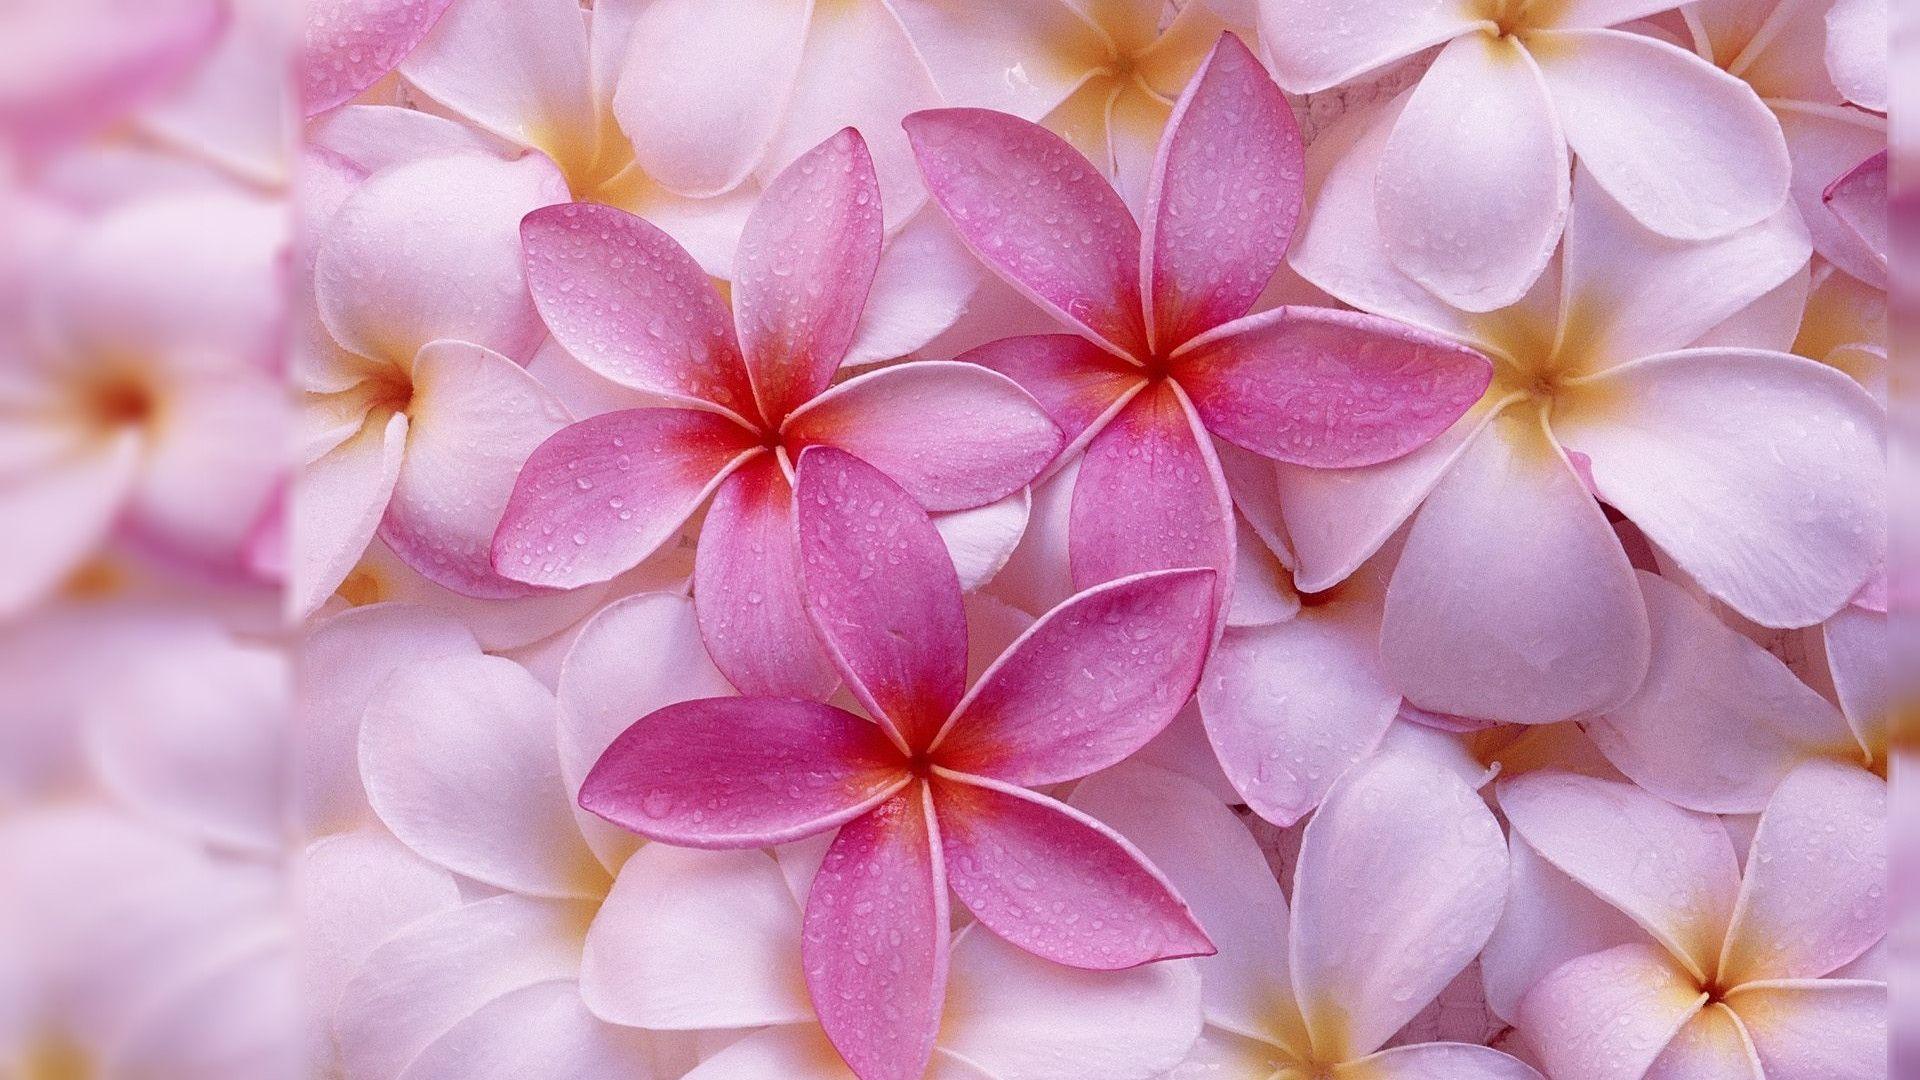 Desktop Backgrounds Flowers - Wallpaper Cave